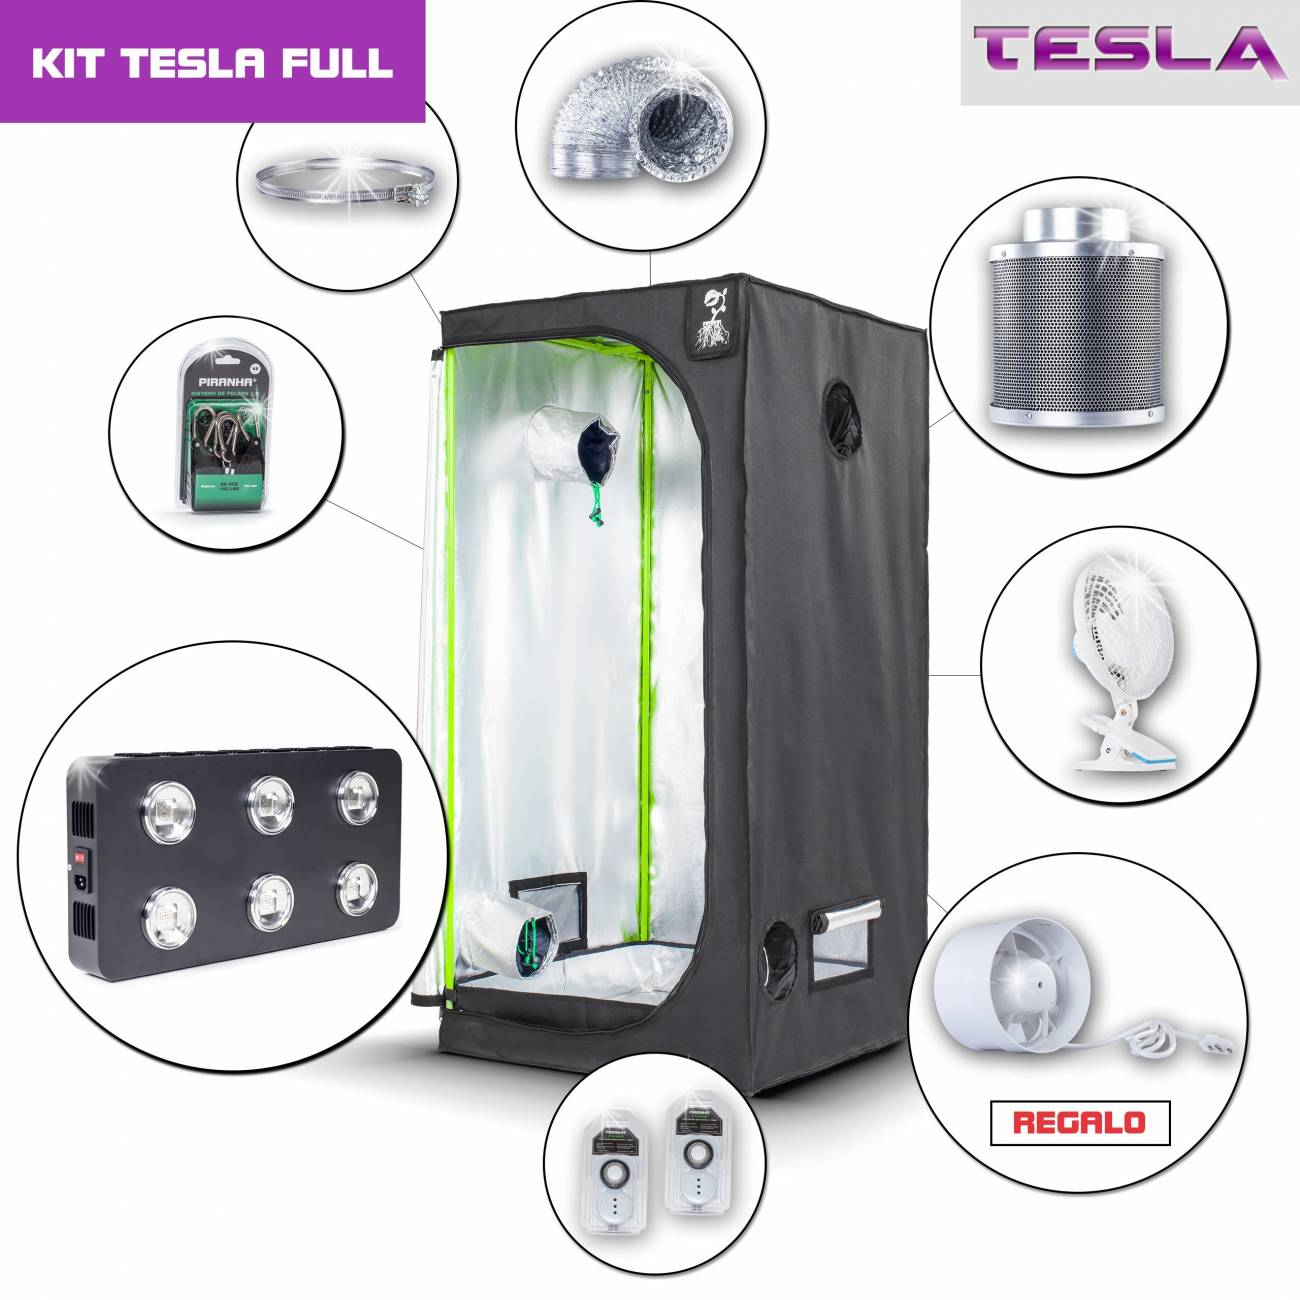 Kit Tesla 80 - T540W Completo